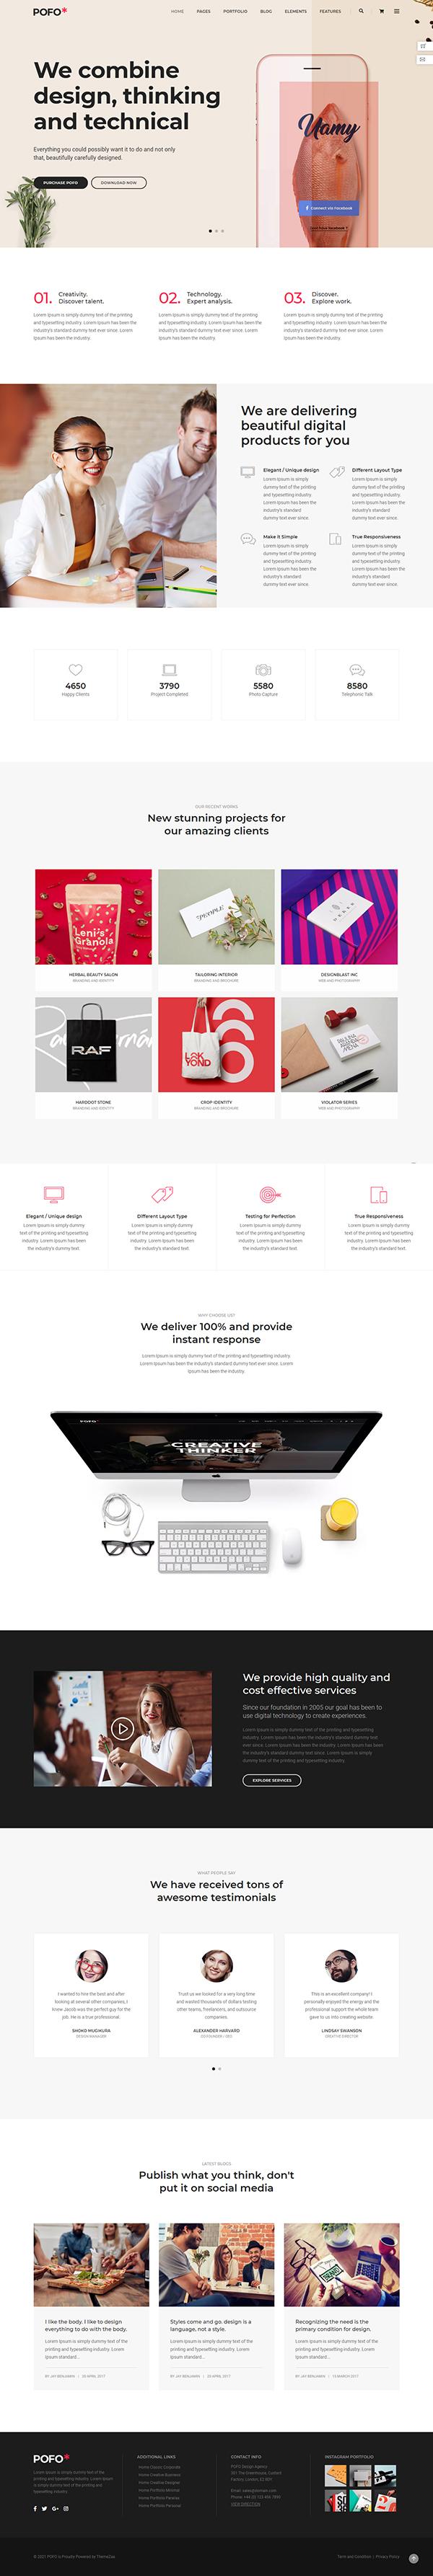 Pofo - Creative Portfolio and Blog WordPress Theme